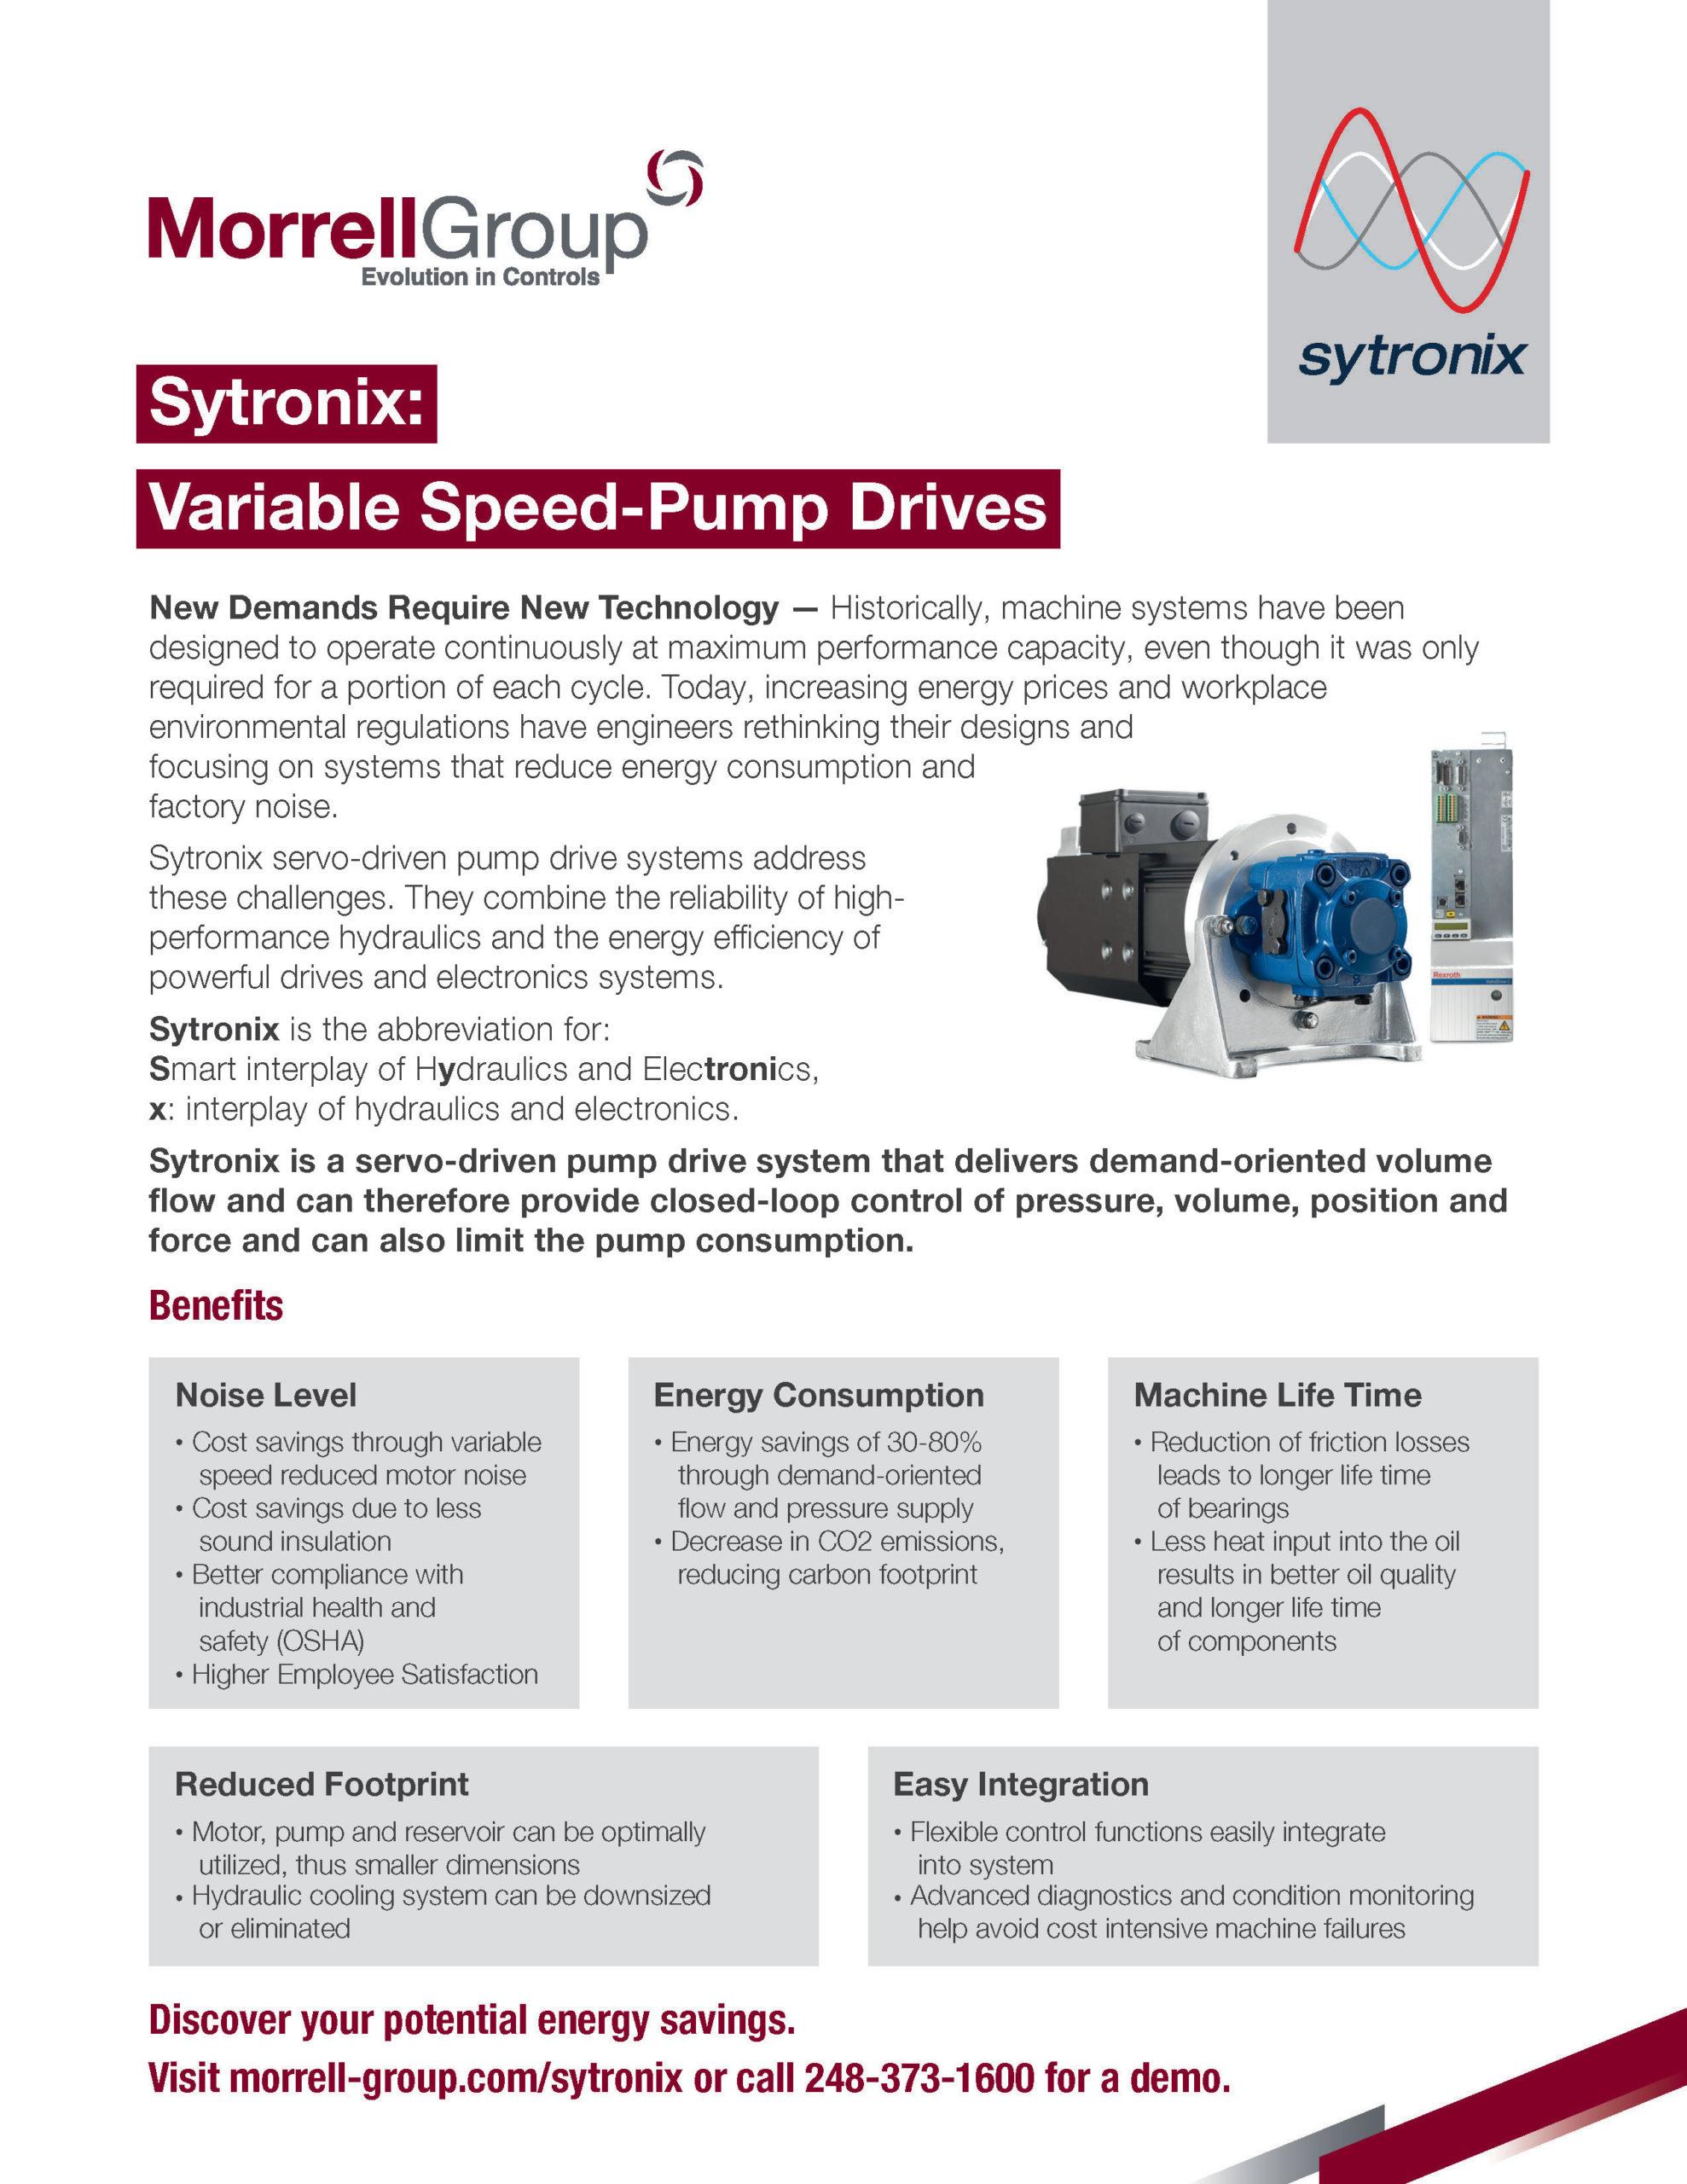 Sytronix Sell Sheet